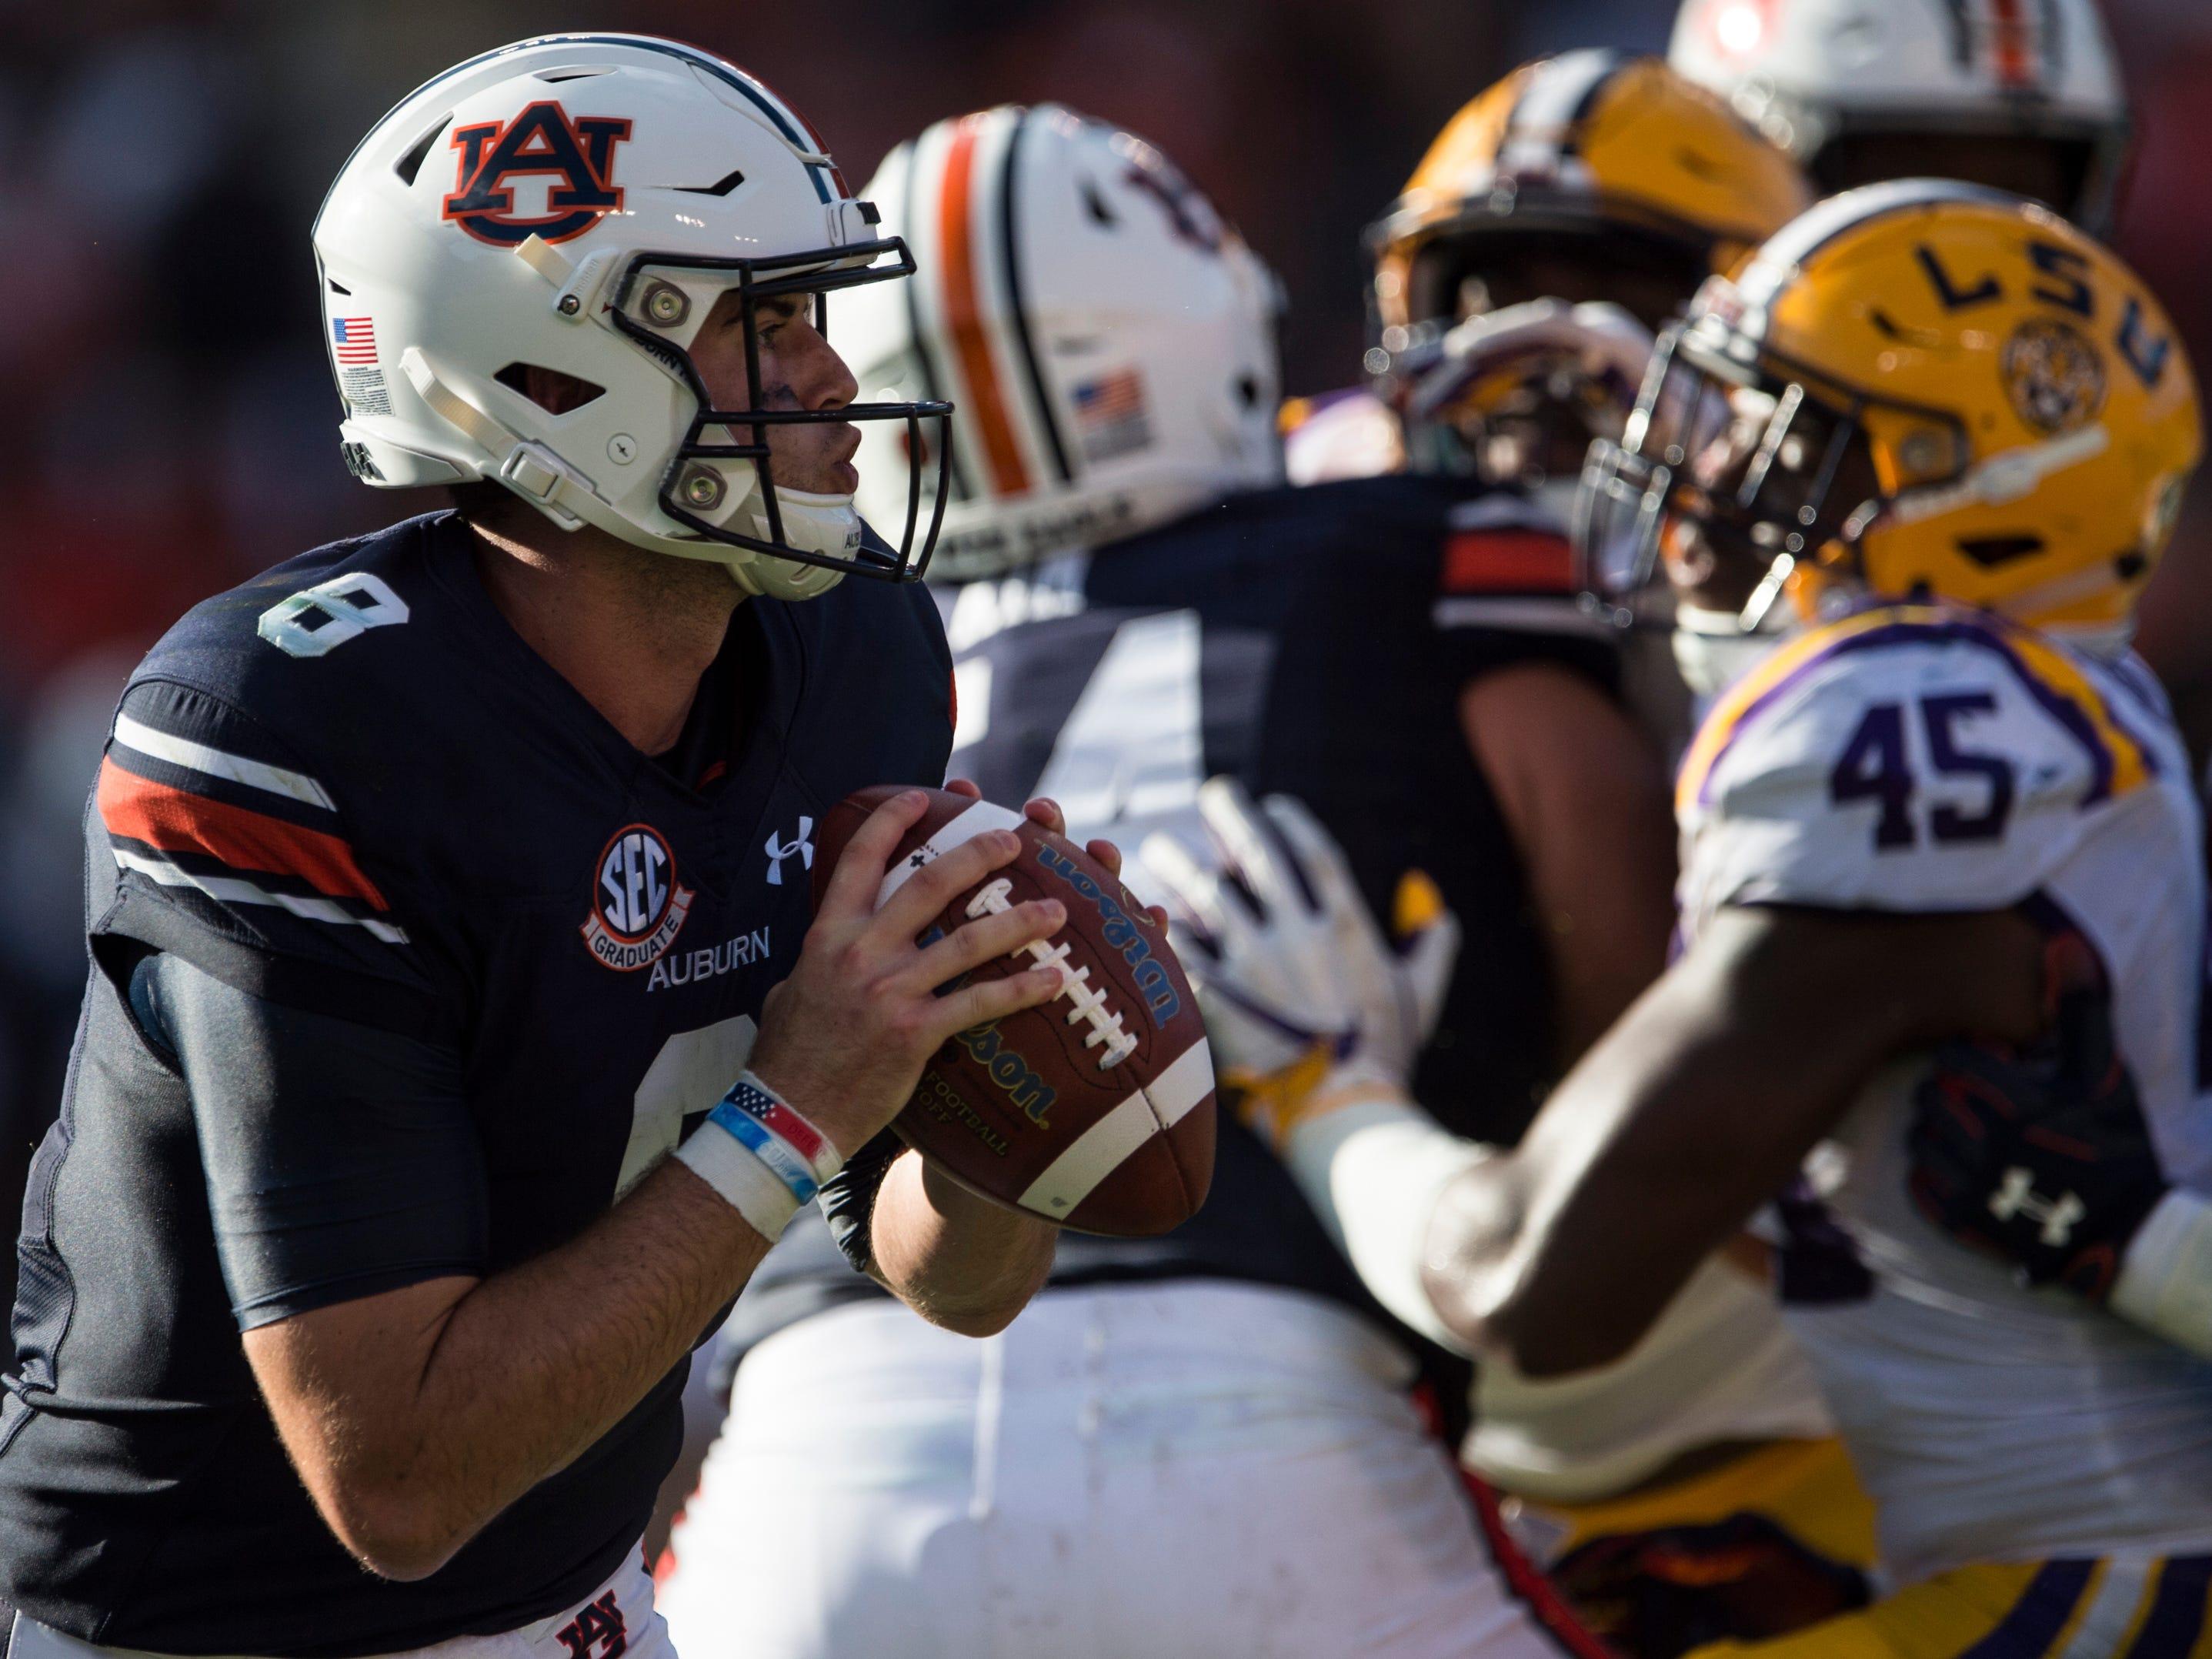 Auburn's Jarrett Stidham (8) looks to make a pass against LSU at Jordan-Hare Stadium in Auburn, Ala., on Saturday, Sept. 15, 2018. LSU defeated Auburn 22-21.